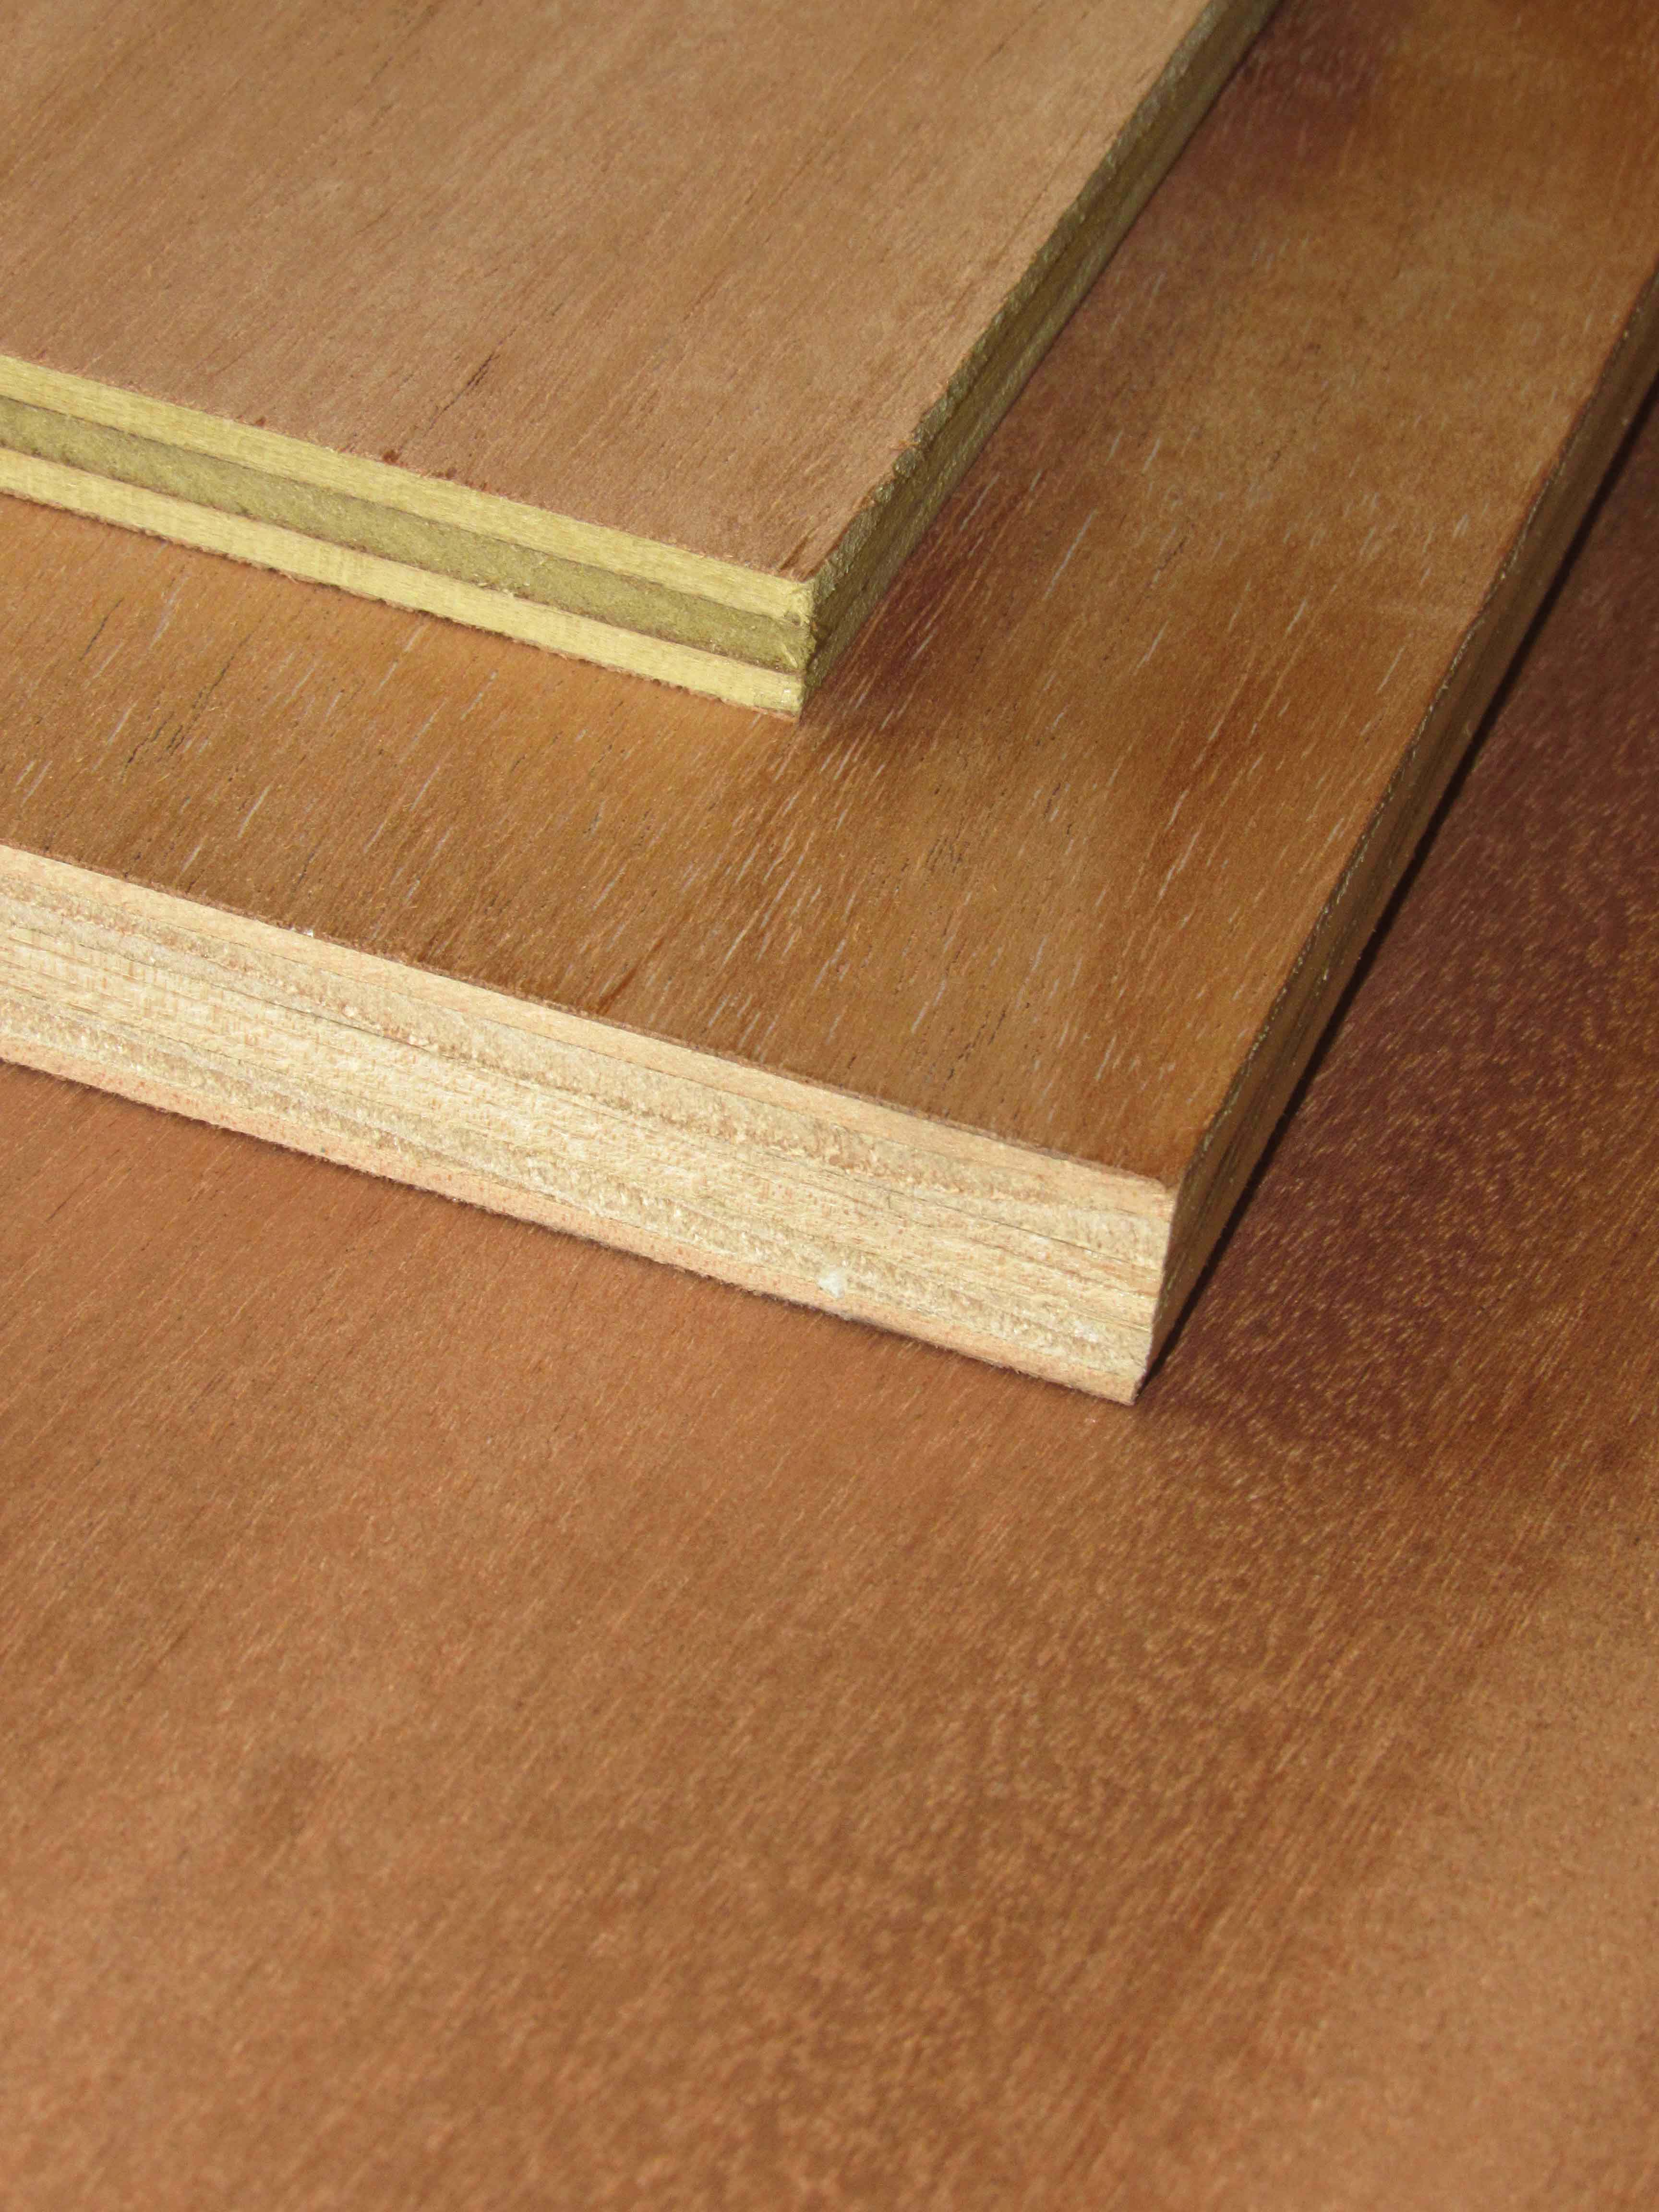 Capitol City Lumber